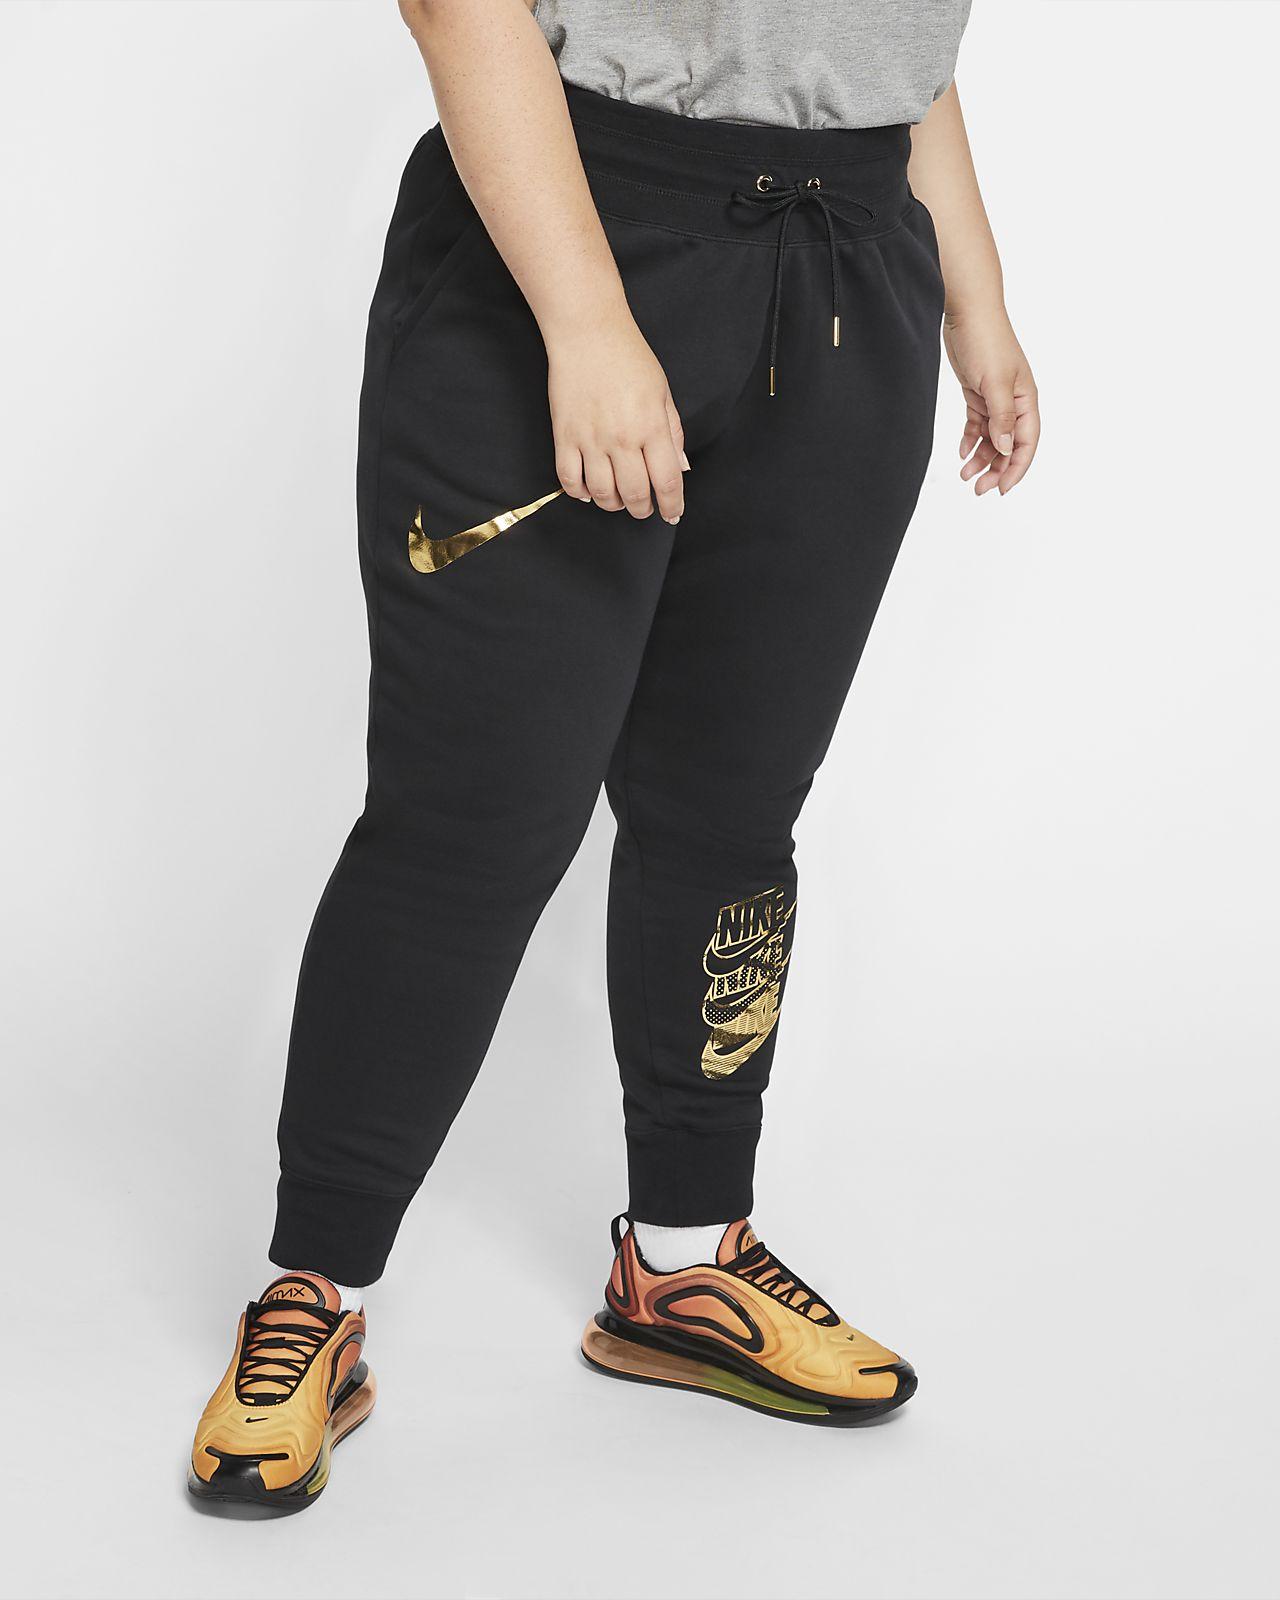 Pantalon Nike Sportswear pour Femme (grande taille)